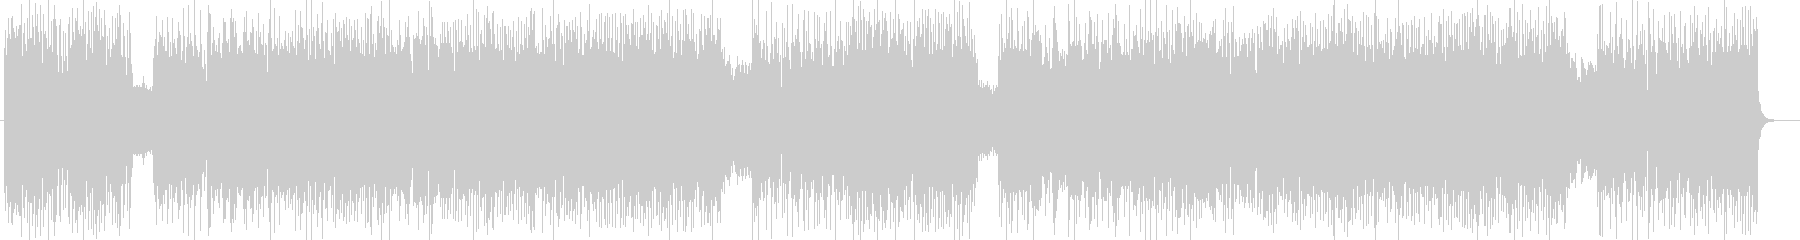 「HR/HM」「METAL」BGM271の未再生の波形